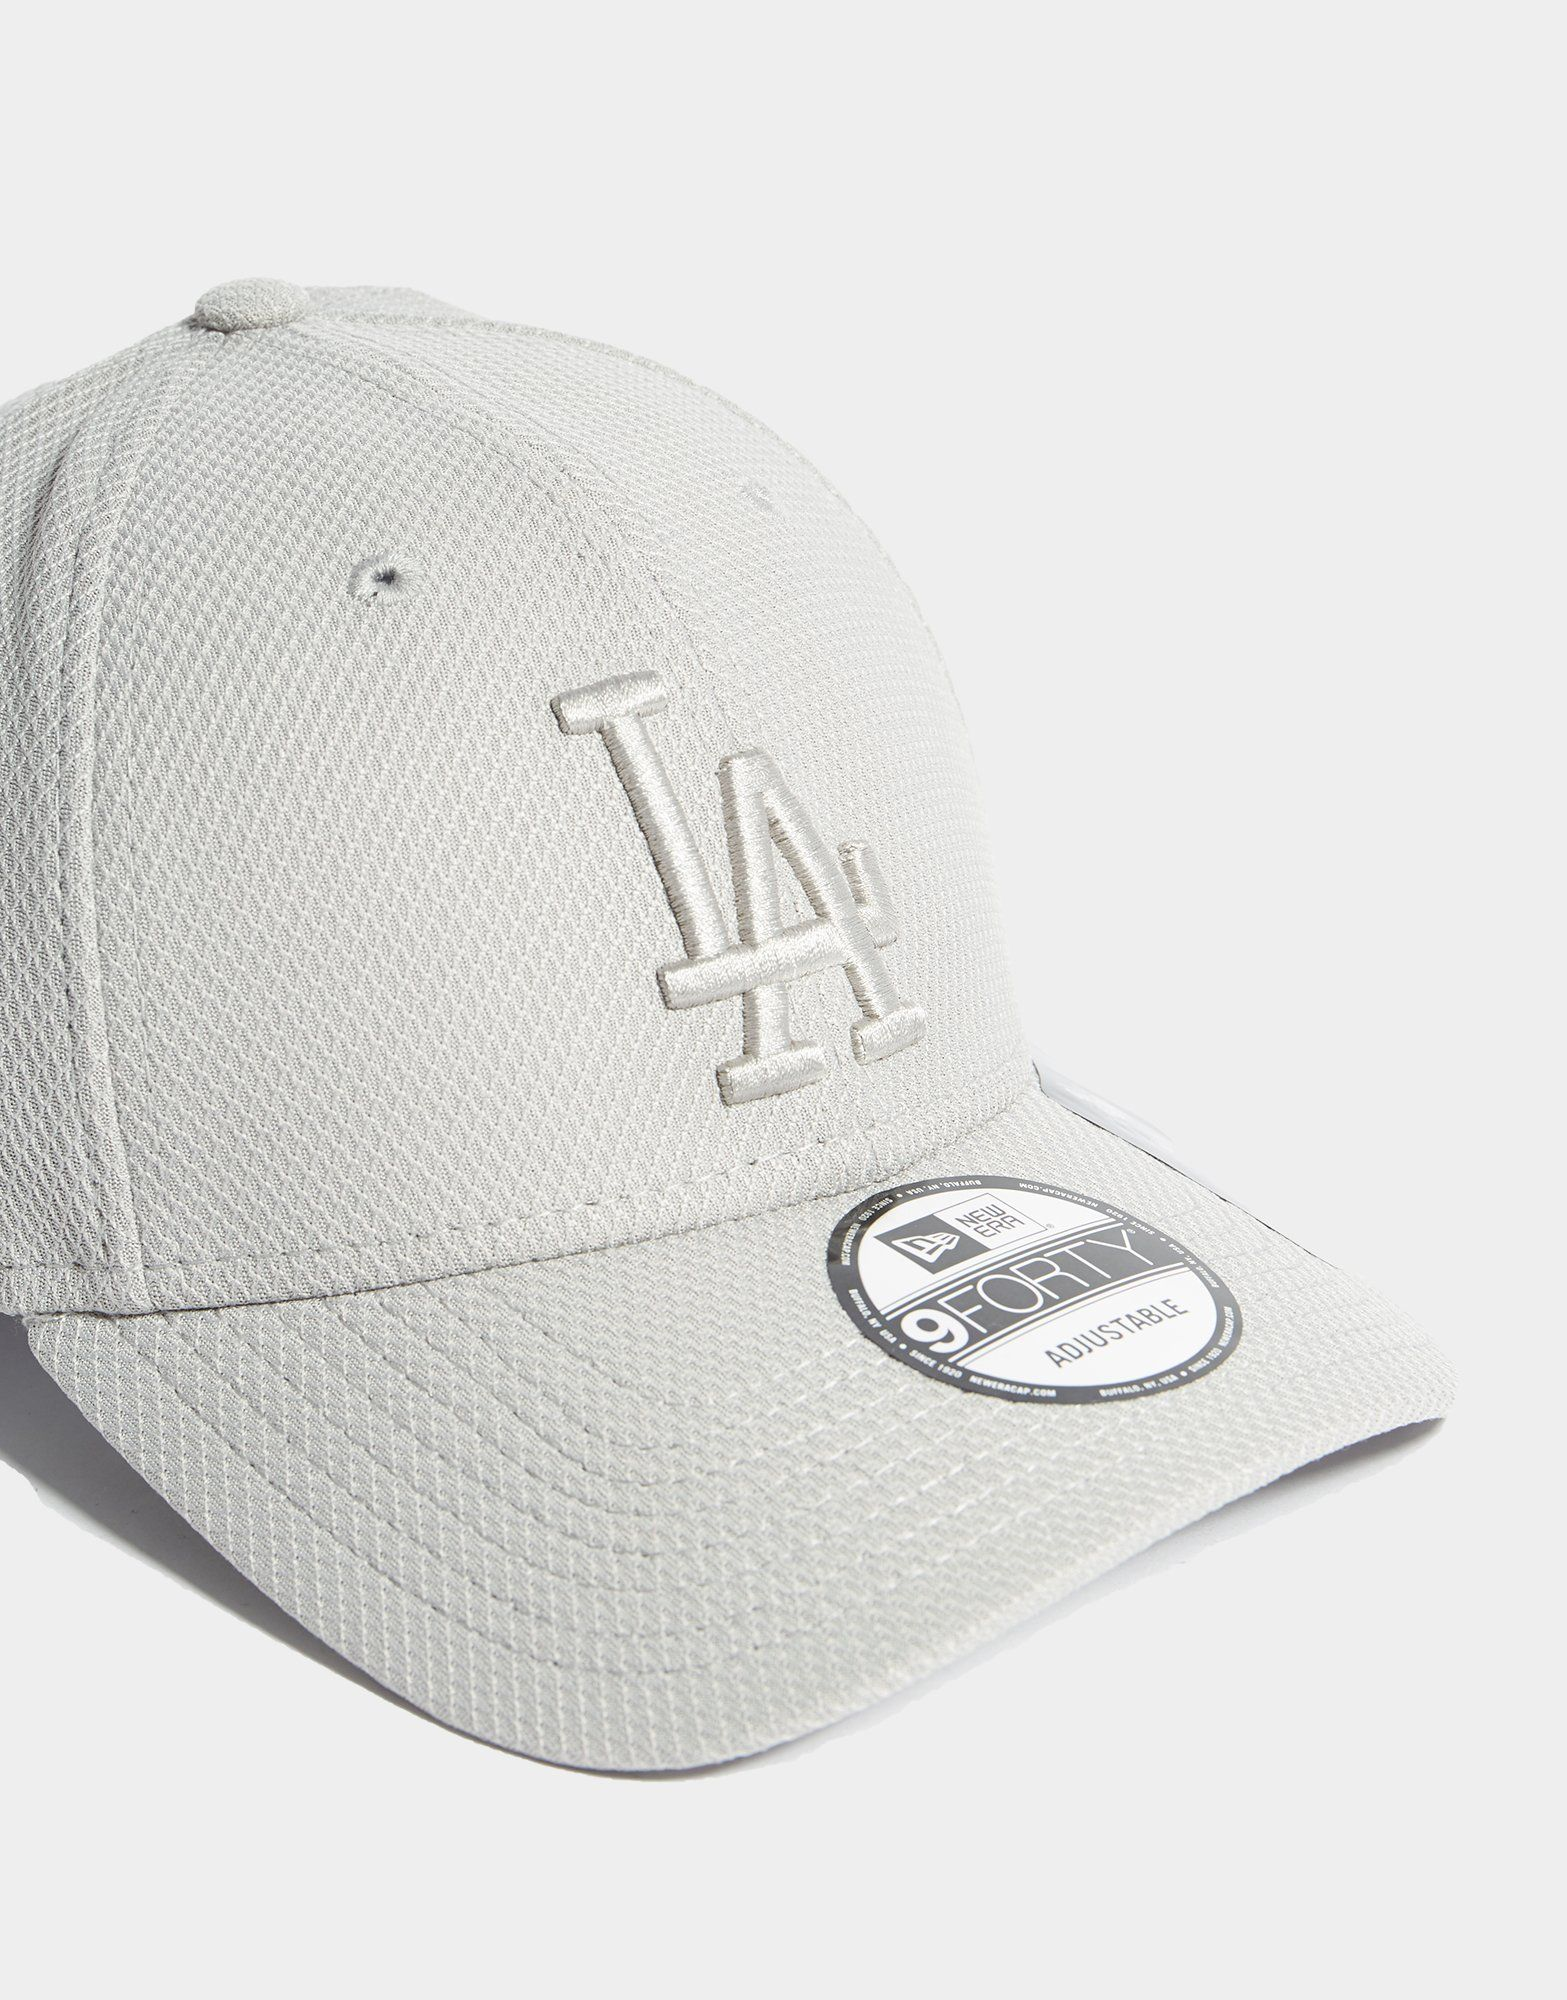 New Era gorra MLB Los Angeles Dodgers 9FORTY Strapback